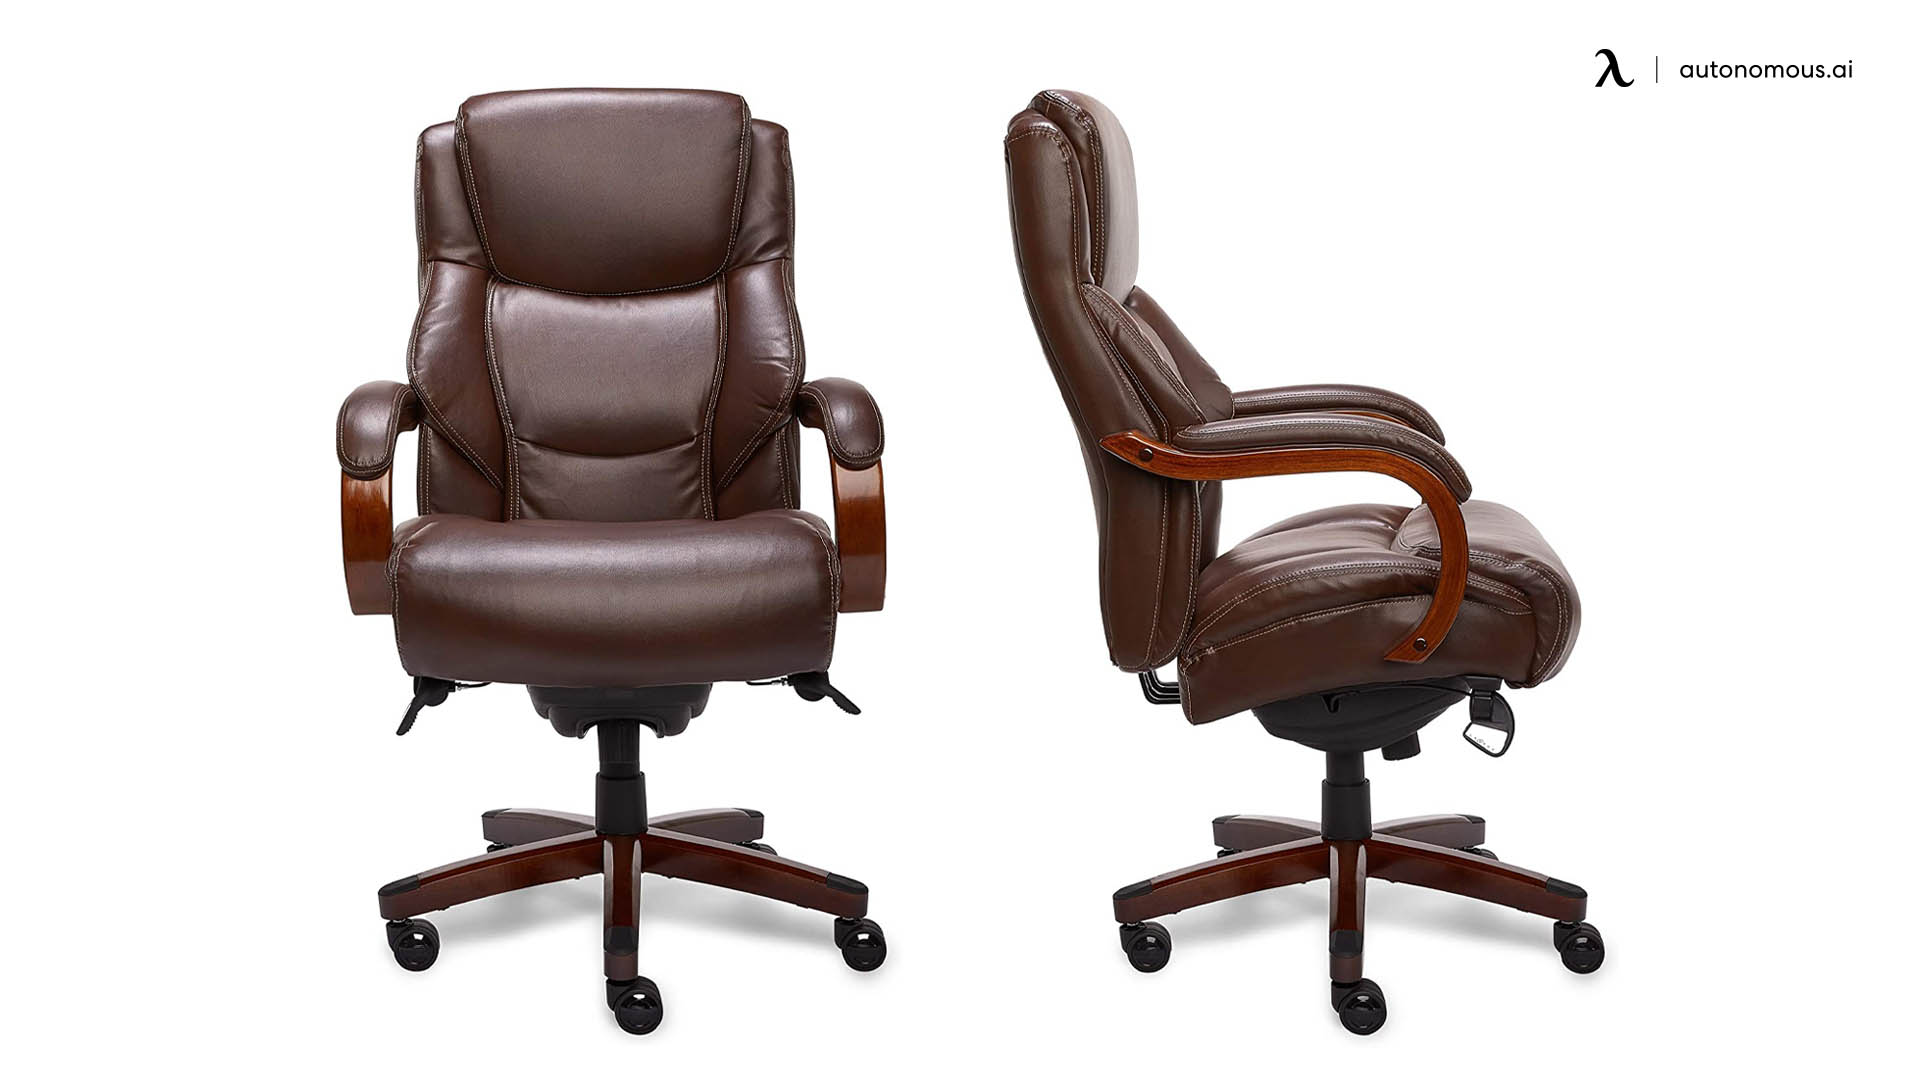 La-Z-Boy Trafford Ergonomic Chair for Upper Back Pain